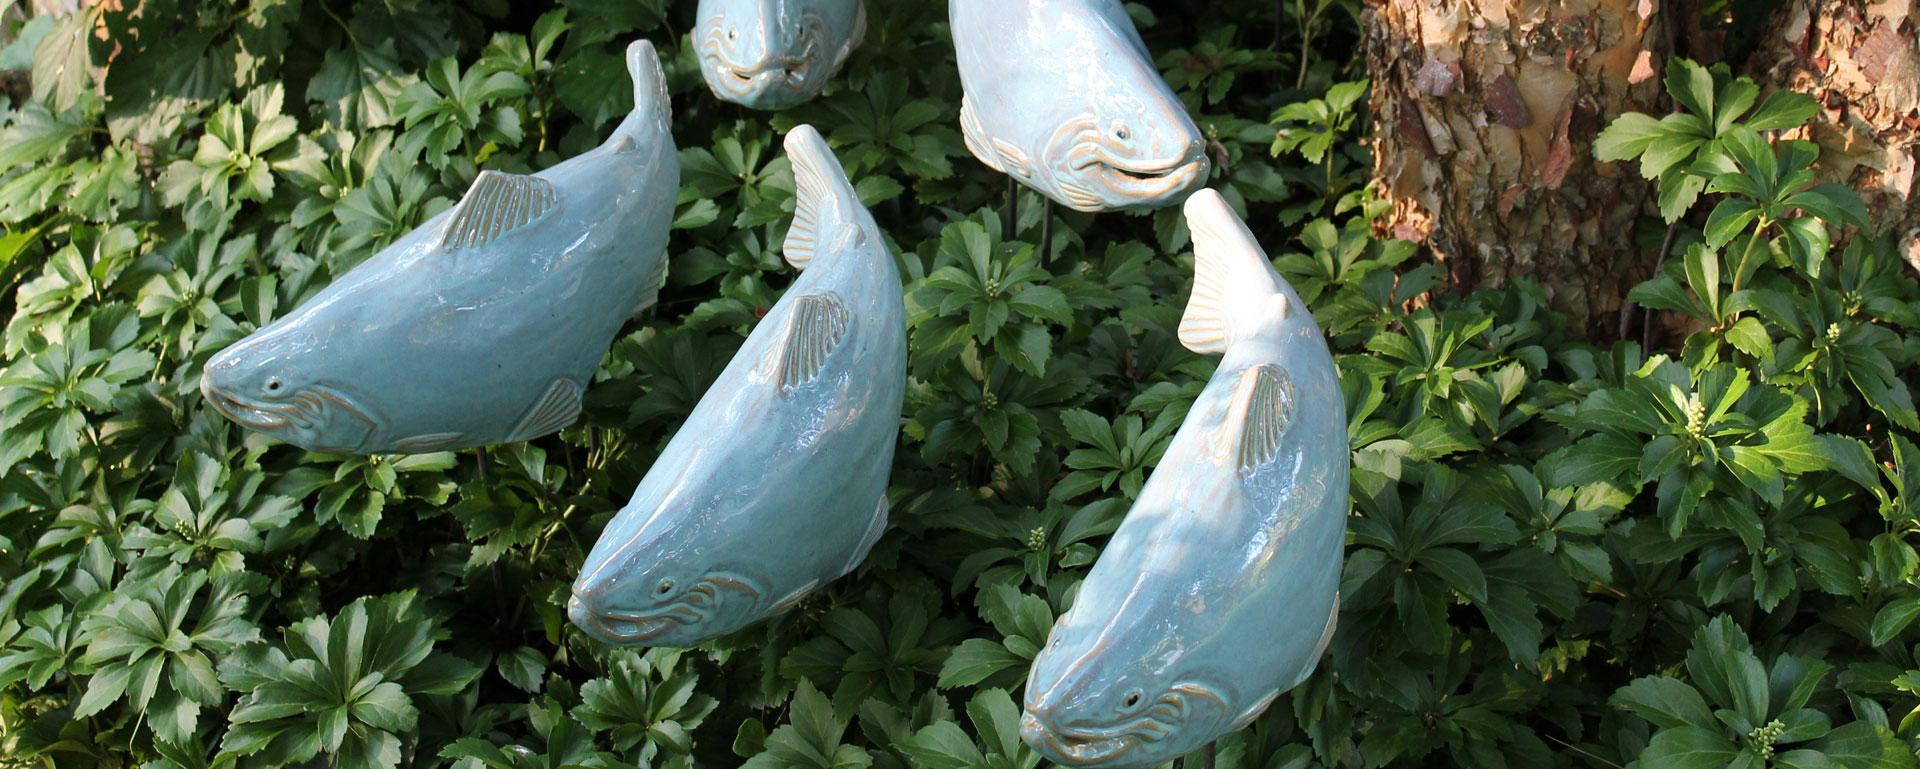 Shop Garden Art Find Garden Sculpture Buy Fish Garden Art